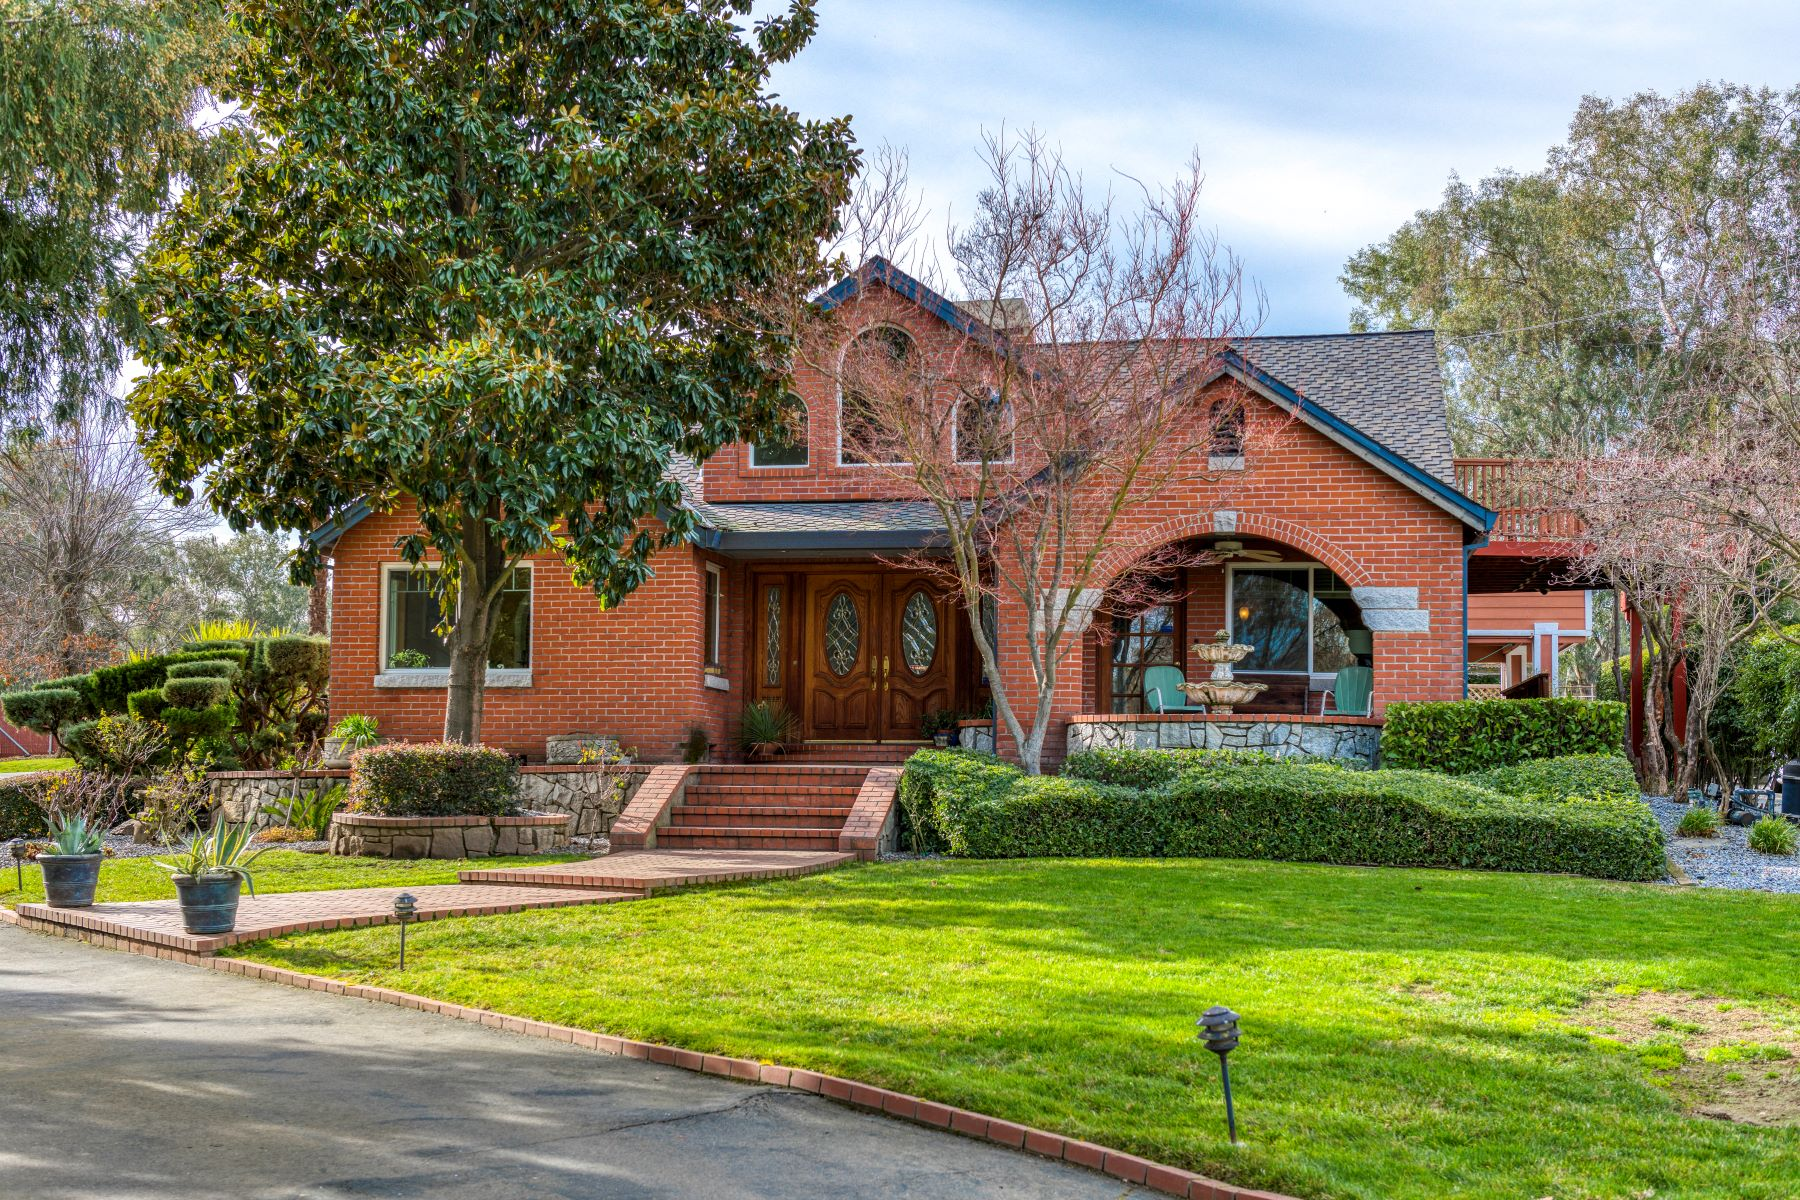 Single Family Homes for Sale at 3988 Delmar Avenue, Loomis, CA 95650 3988 Delmar Avenue Loomis, California 95650 United States